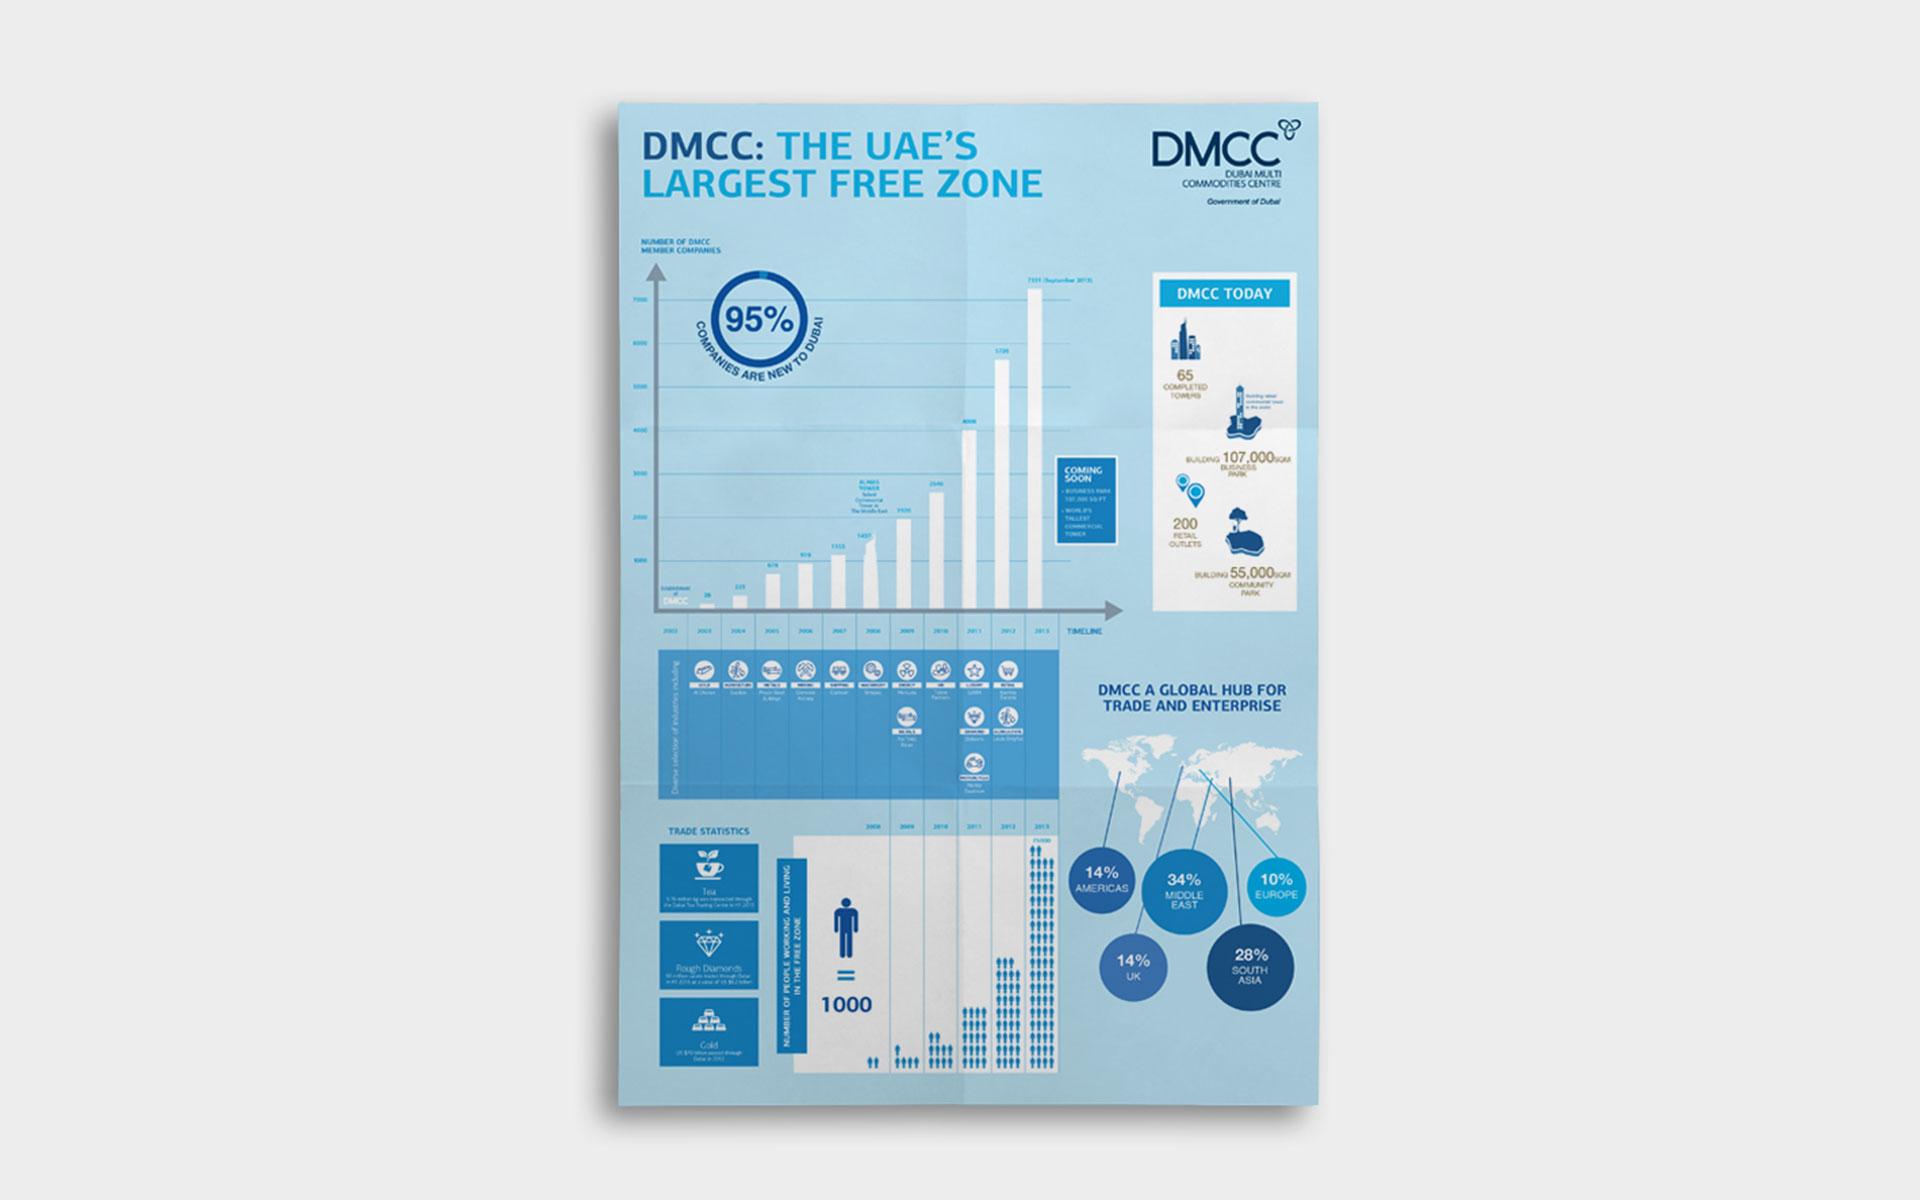 dmcc_ig1